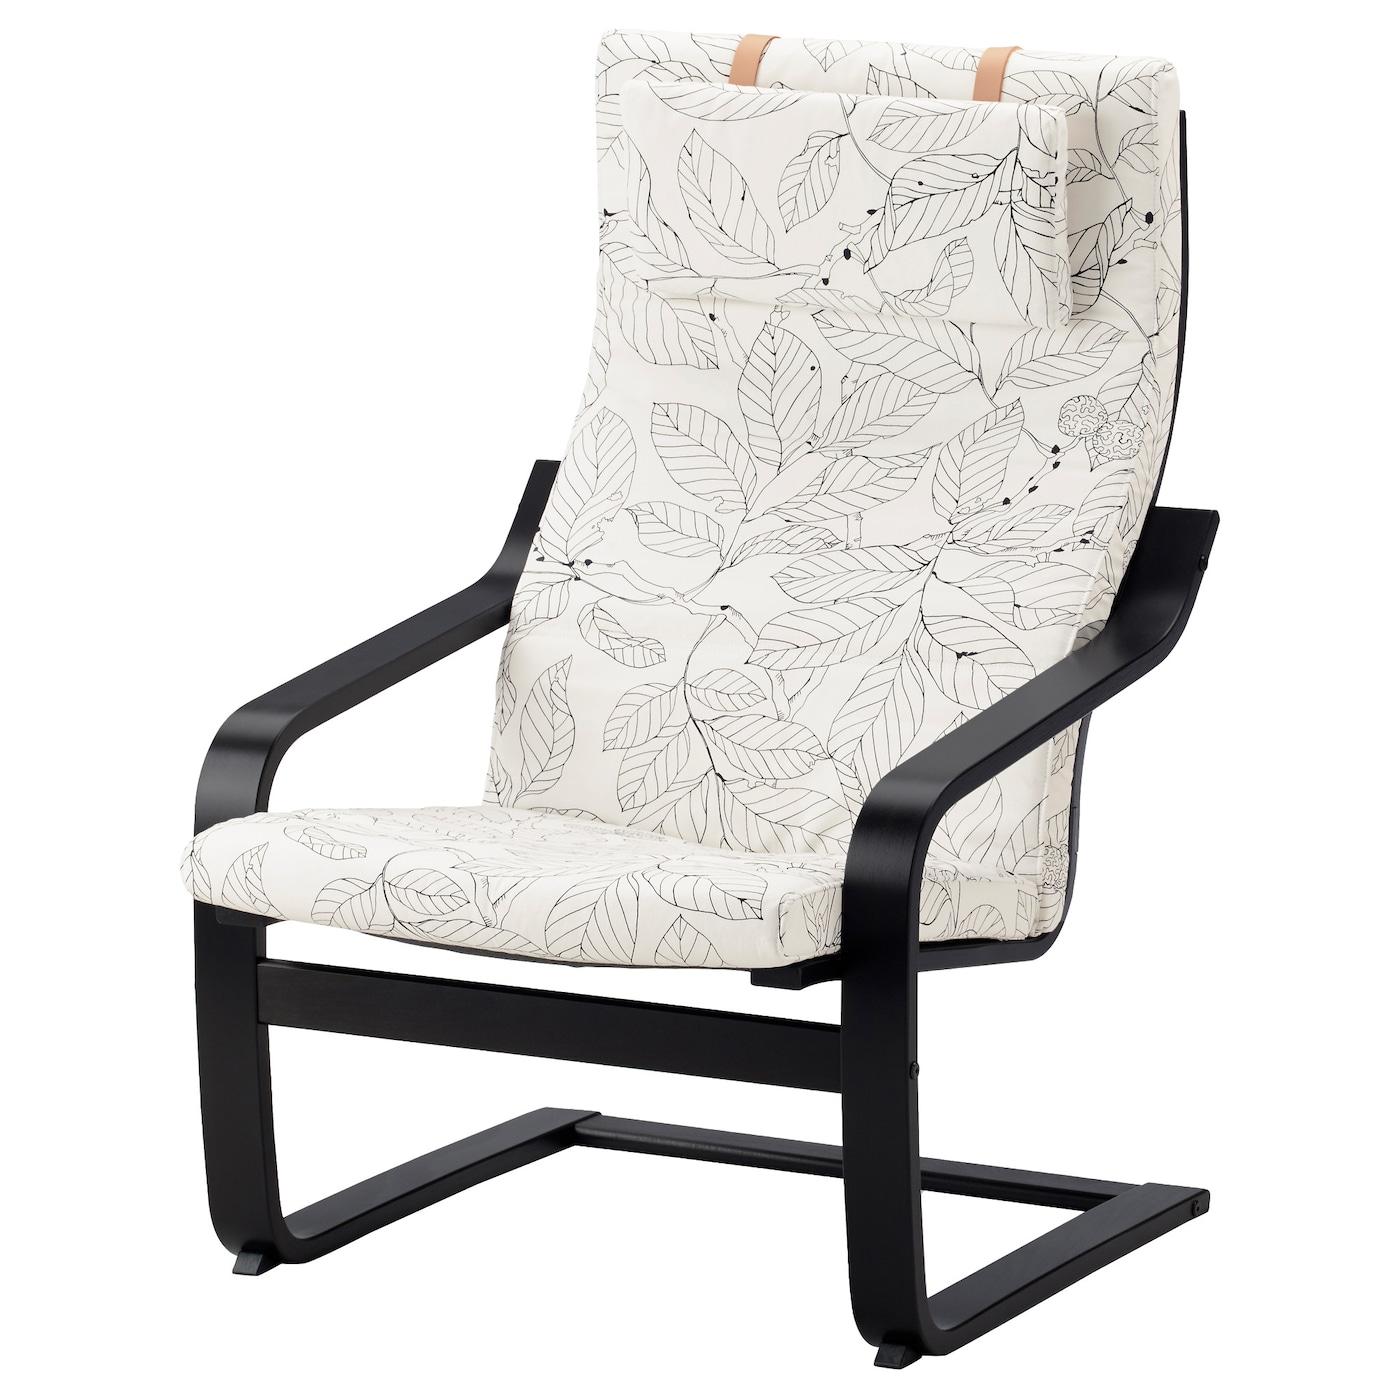 IKEA POÄNG Fotel, czarnybrąz, Vislanda czarny/biały